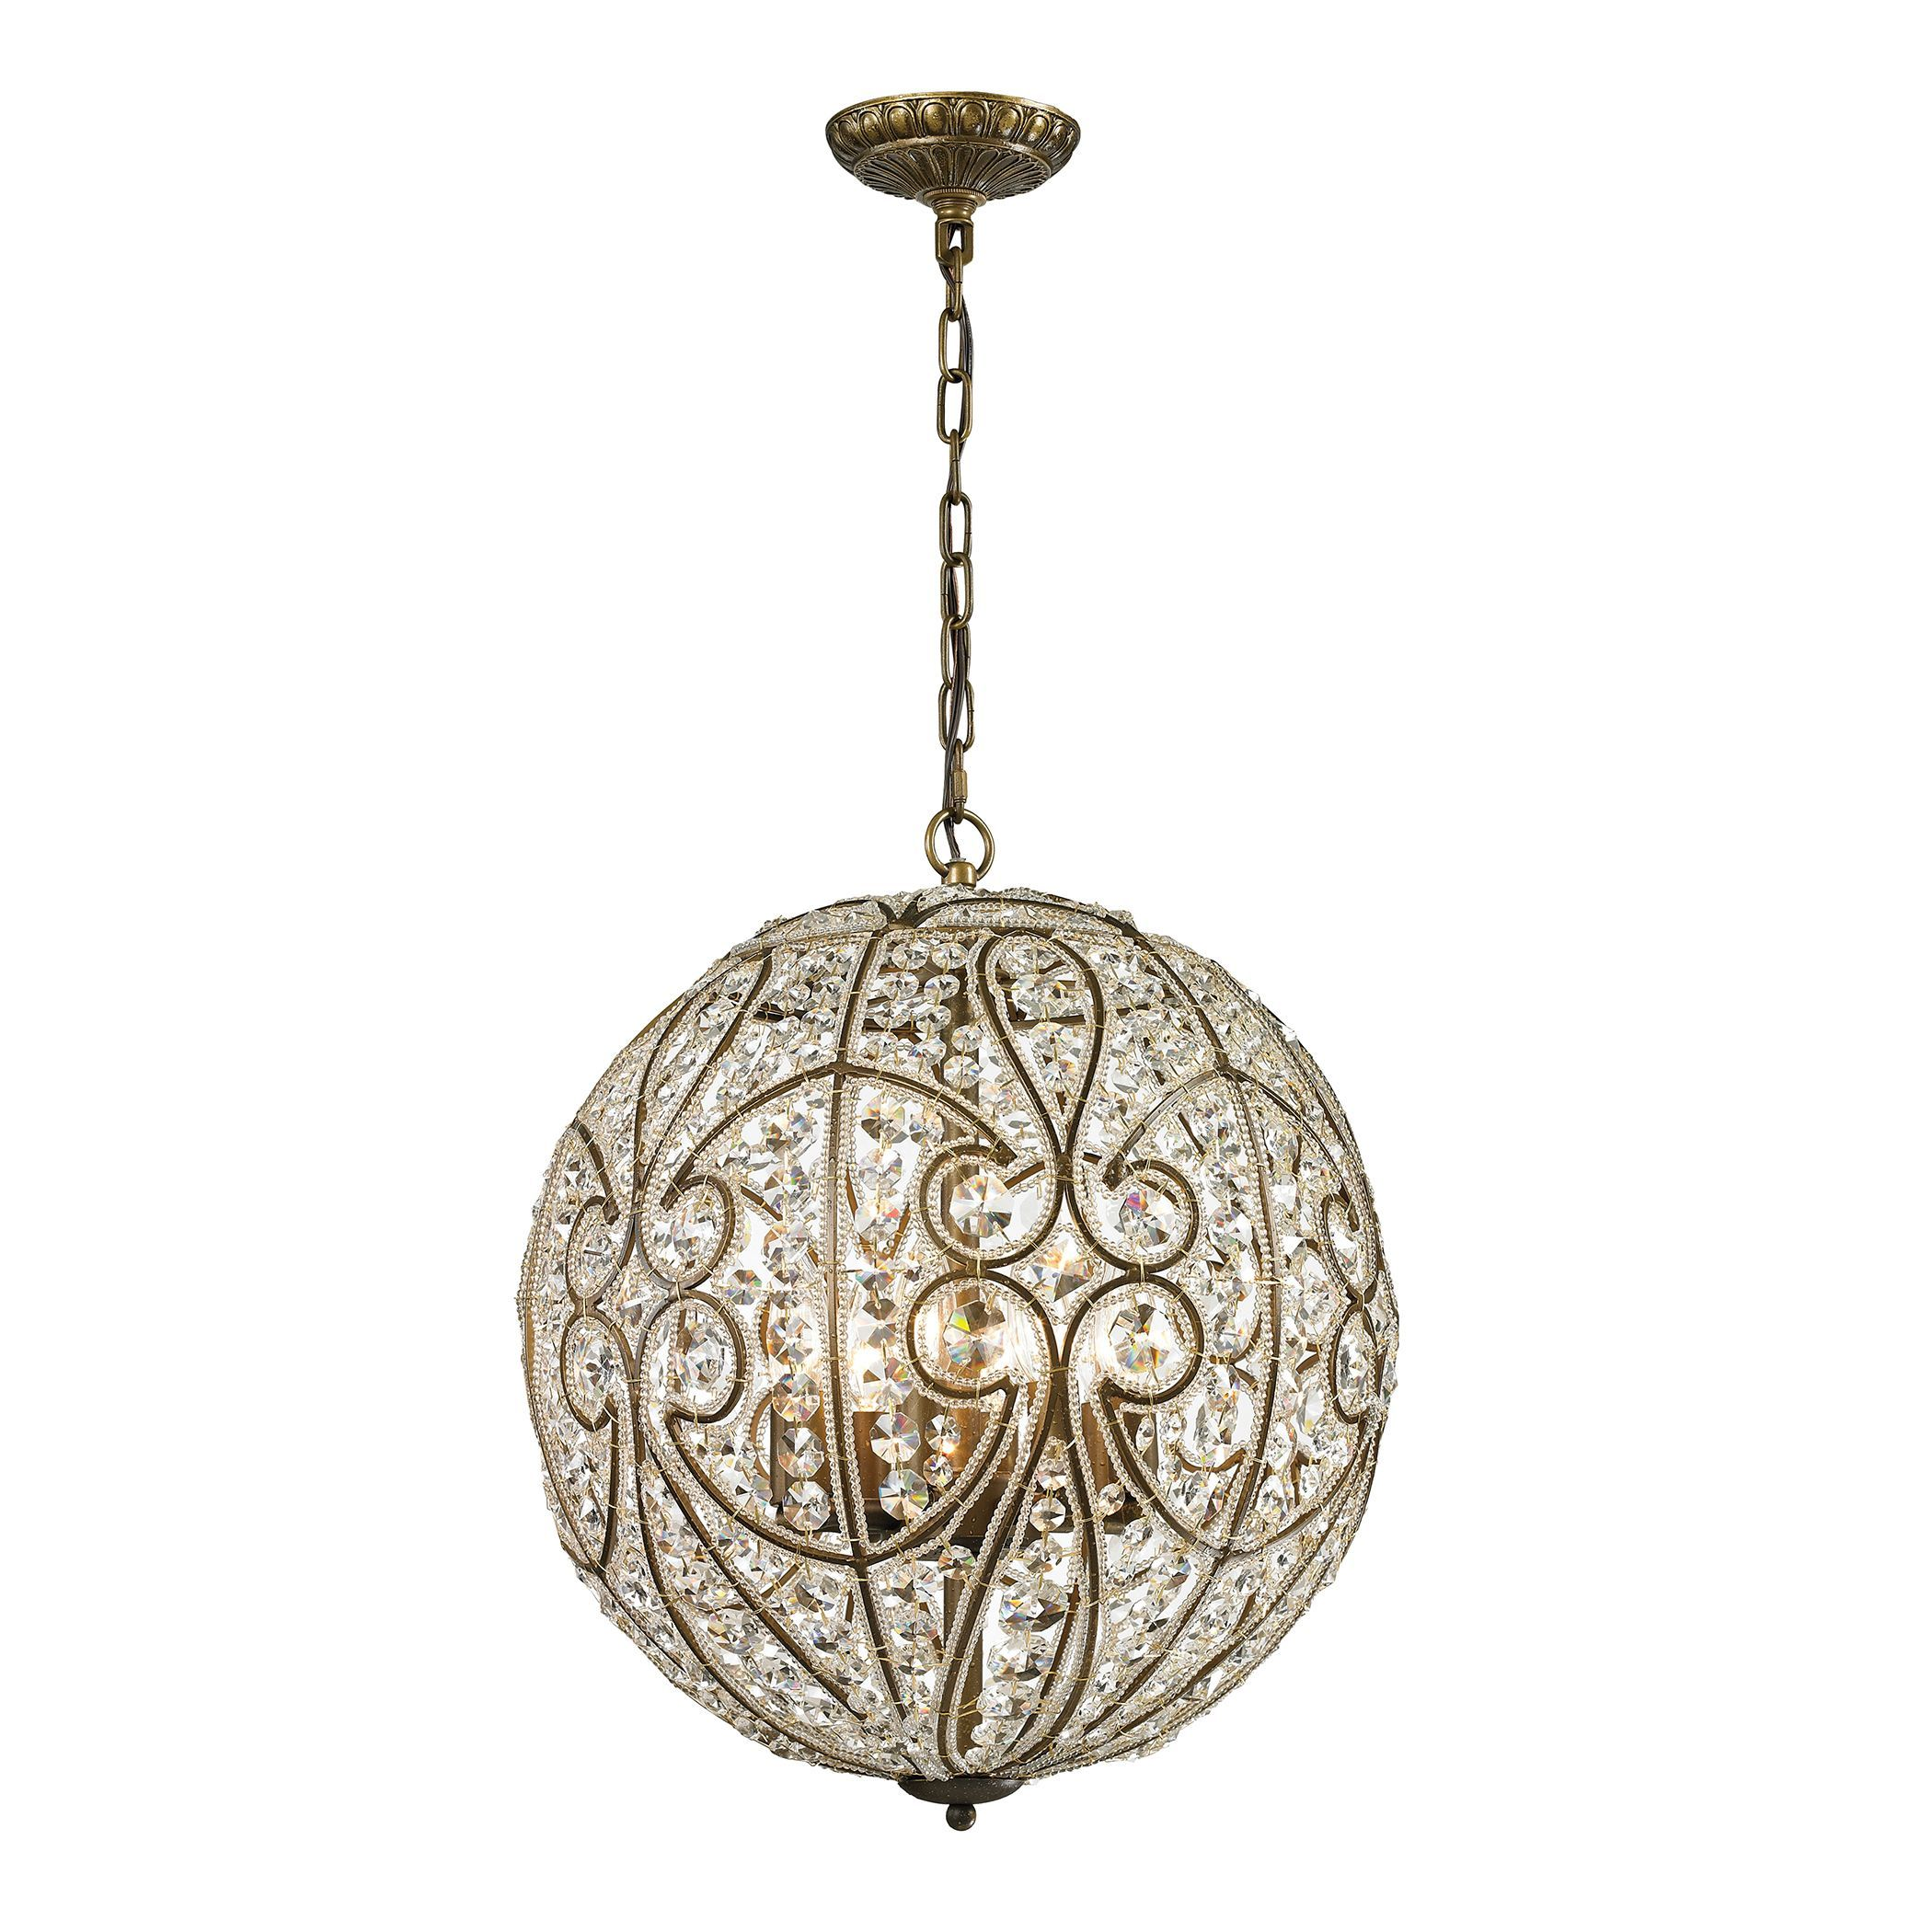 Elk lighting elizabethan aged bronze and crystal 8 light pendant by elk lighting elizabethan aged bronze and crystal 8 light pendant by elk lighting arubaitofo Images